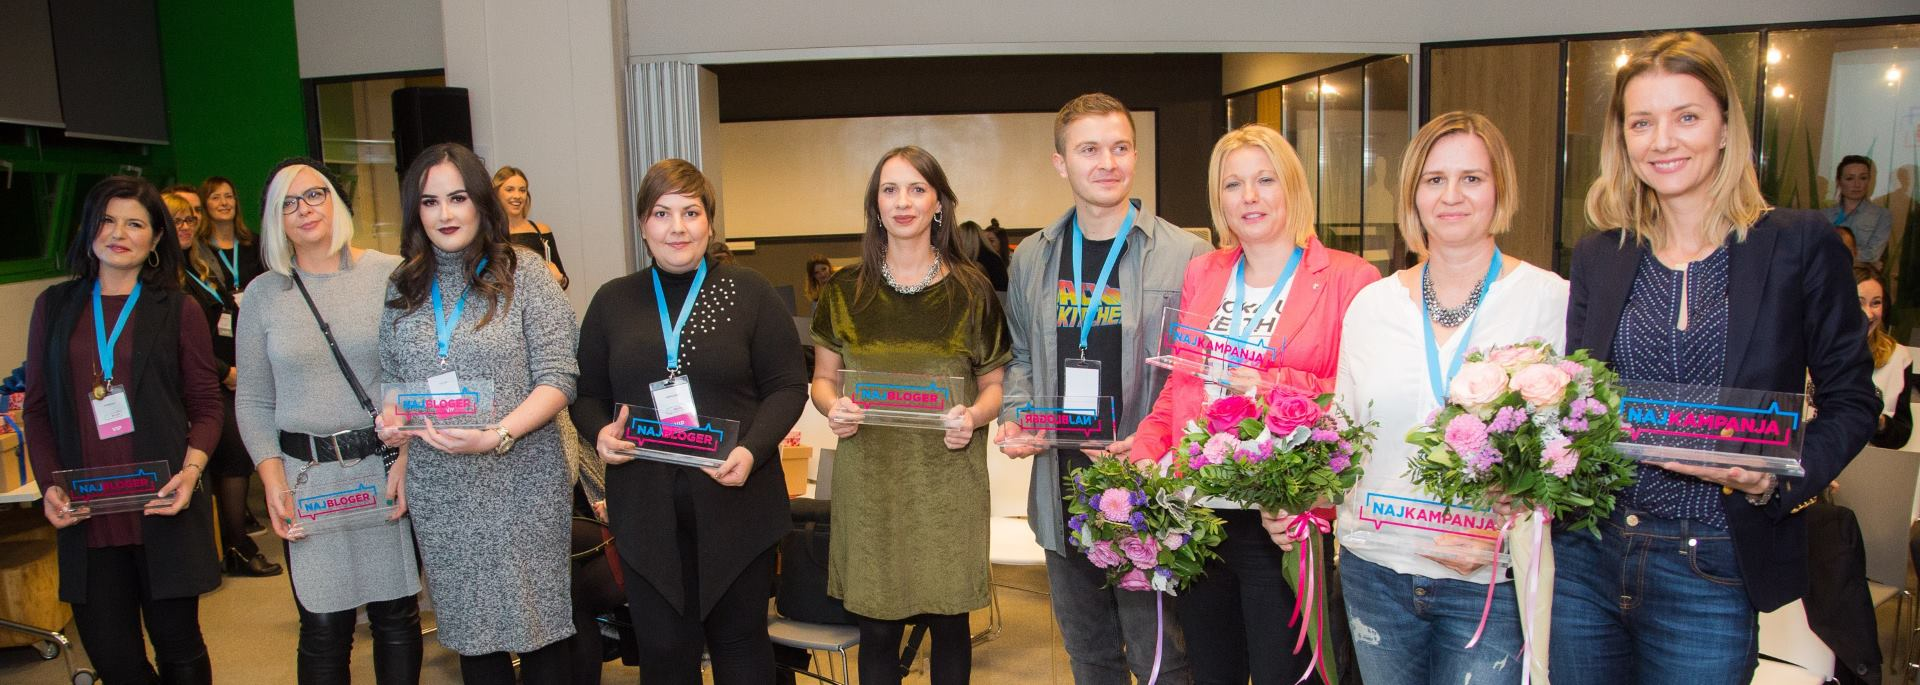 FOTO: Hrvatski blogeri odabrali najbolje lifestyle i gastro blogere i top brendove